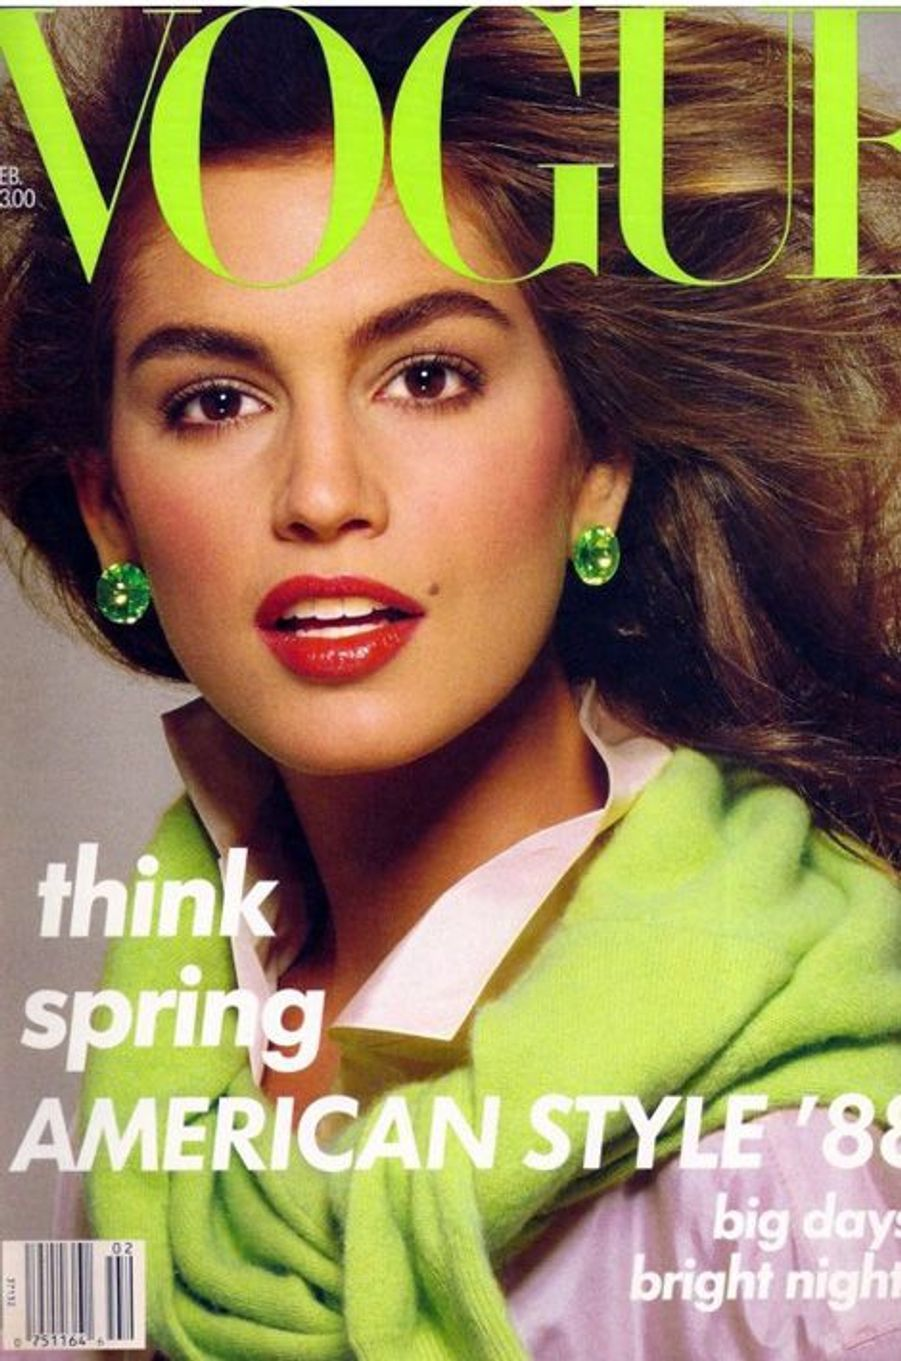 Vogue, 1988